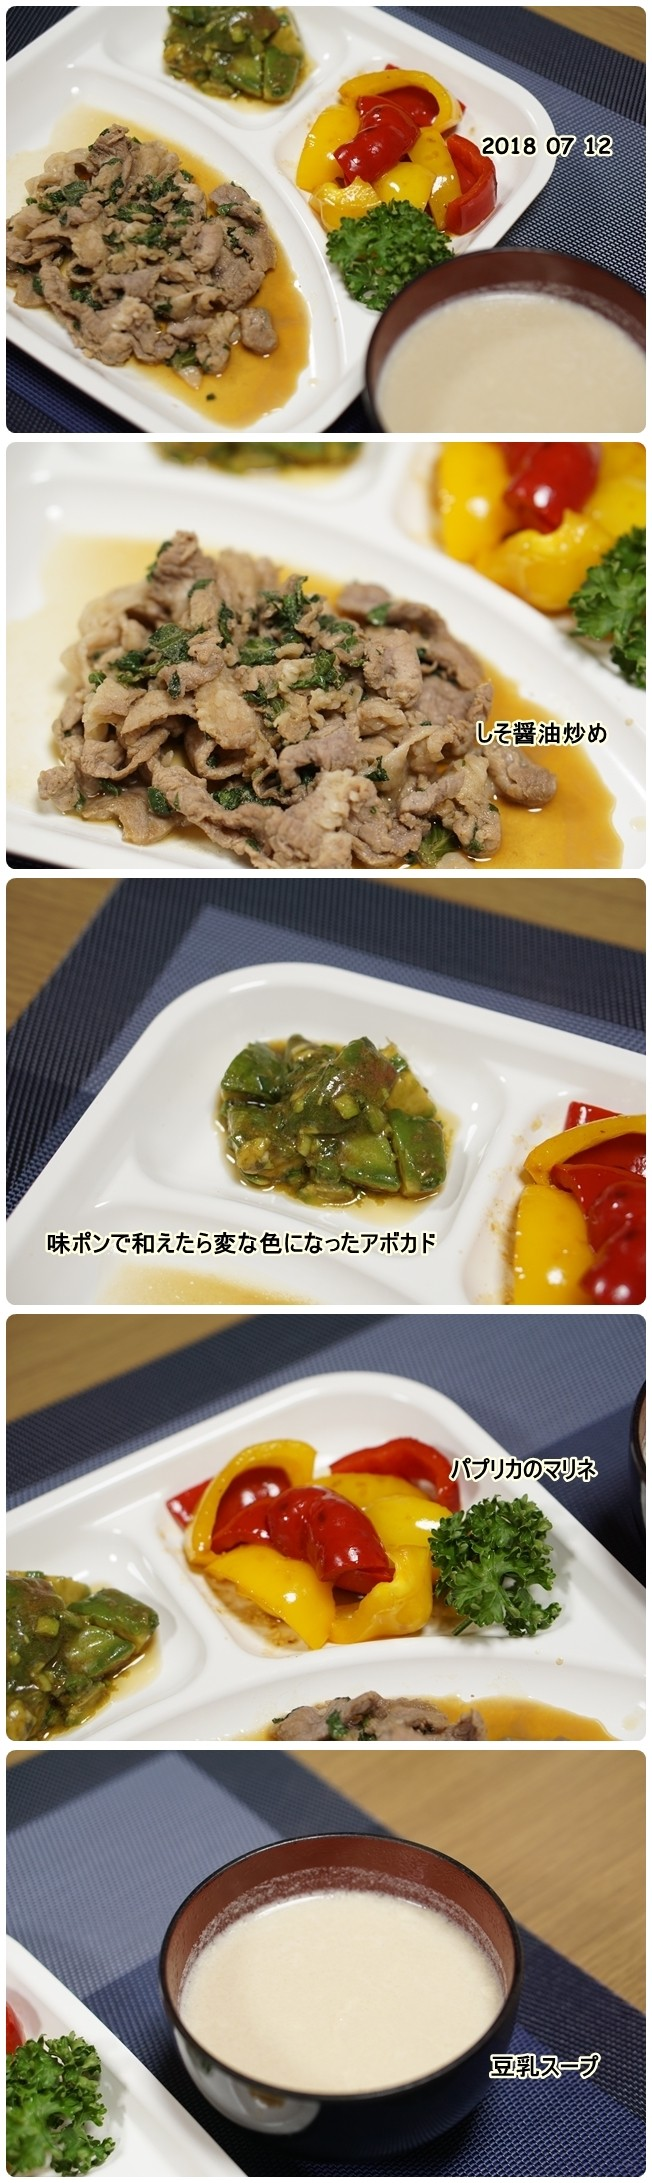 ■DSC08971-vert